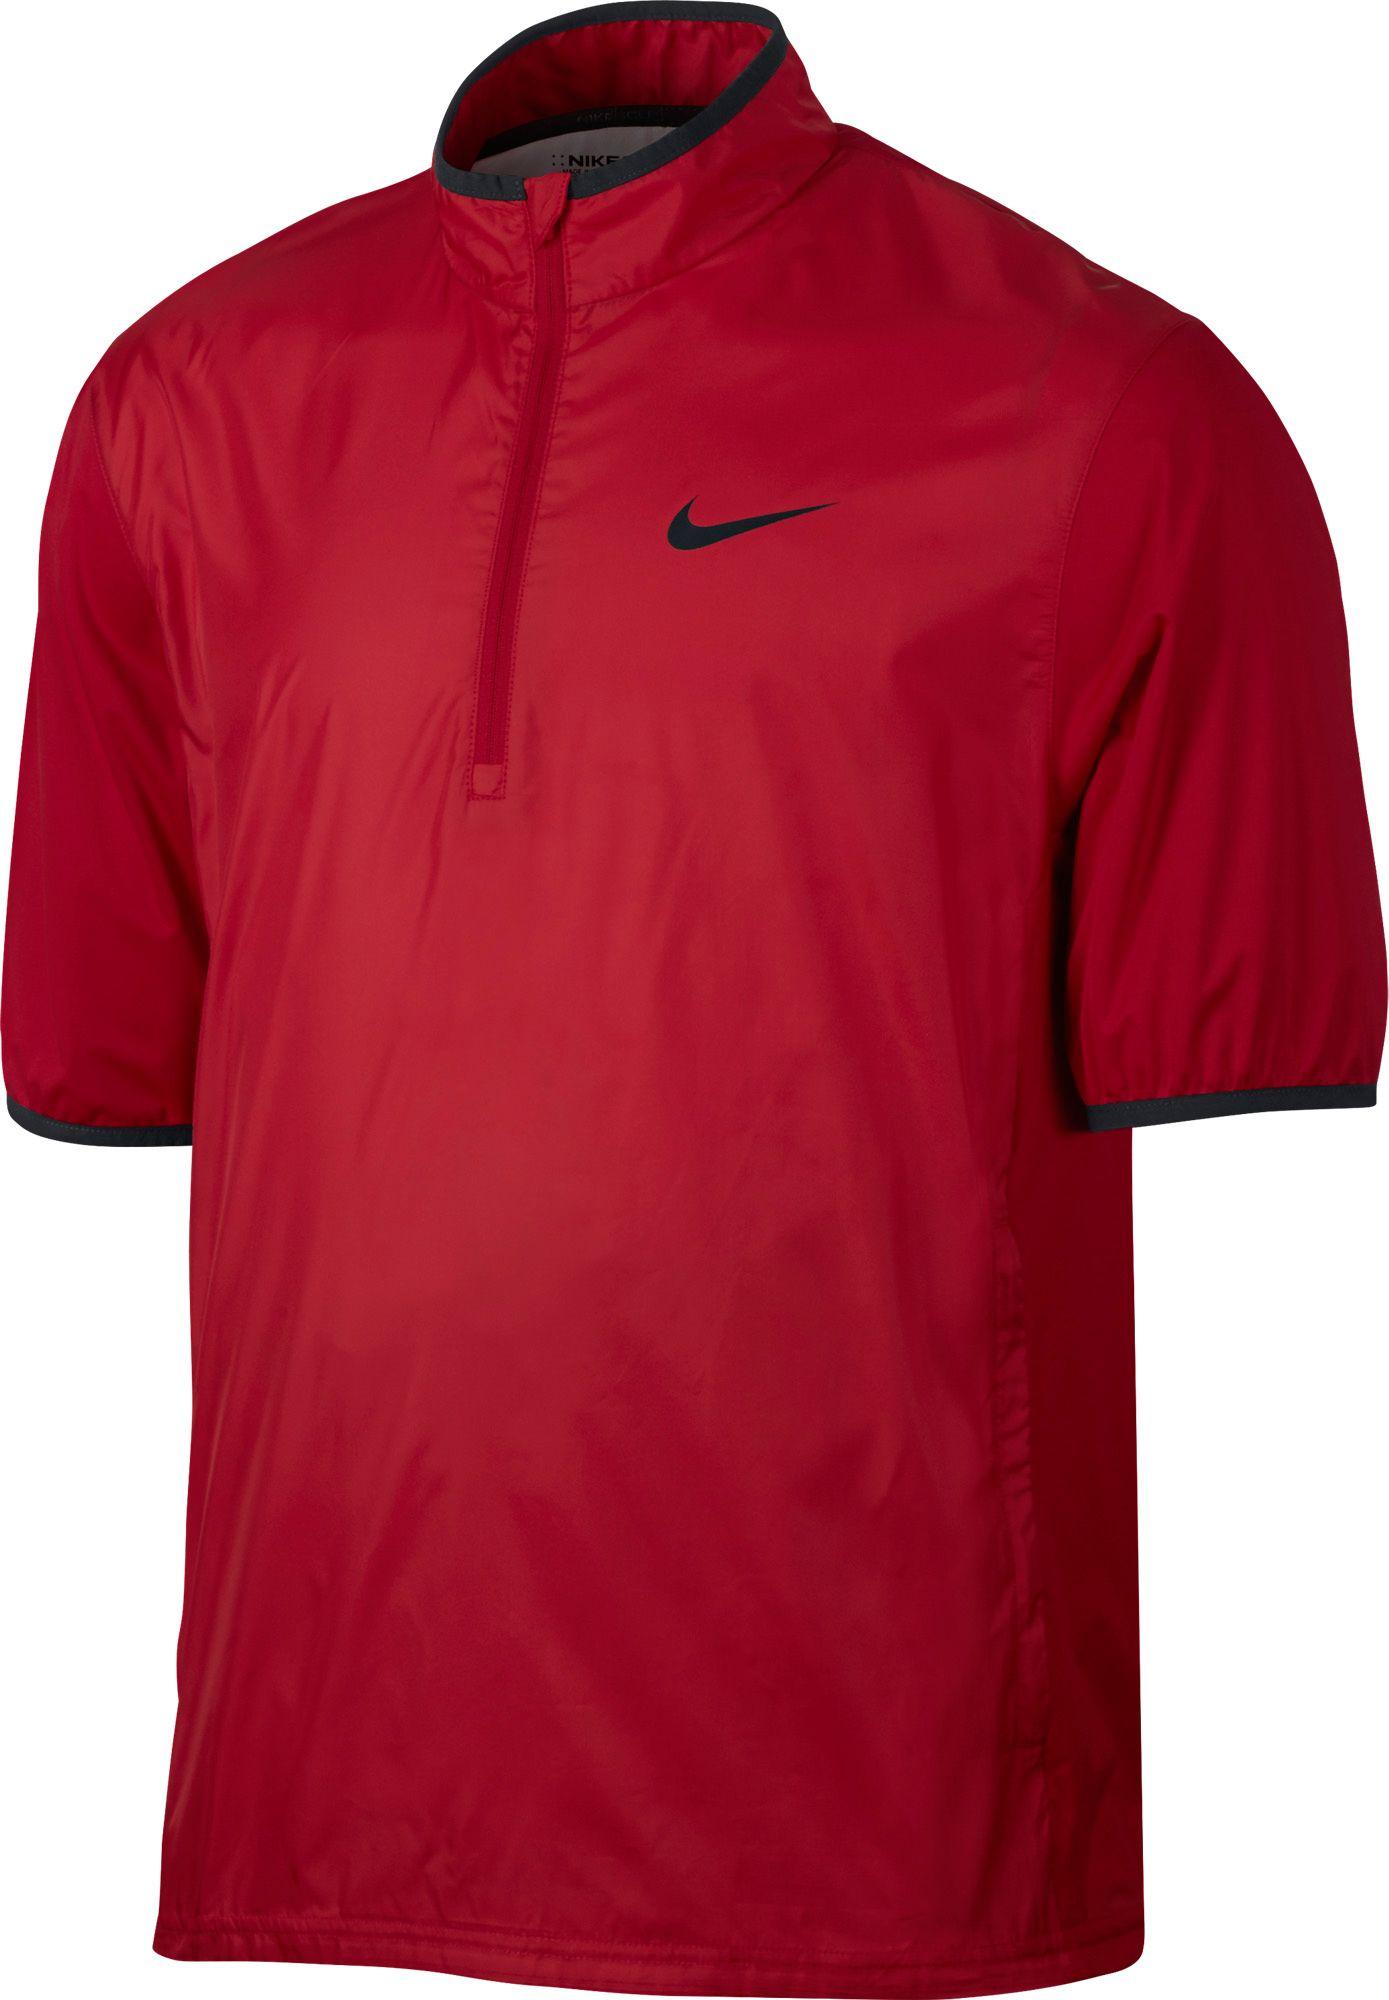 Mens jacket deals - Product Image Nike Men S Shield Half Zip Short Sleeve Golf Jacket